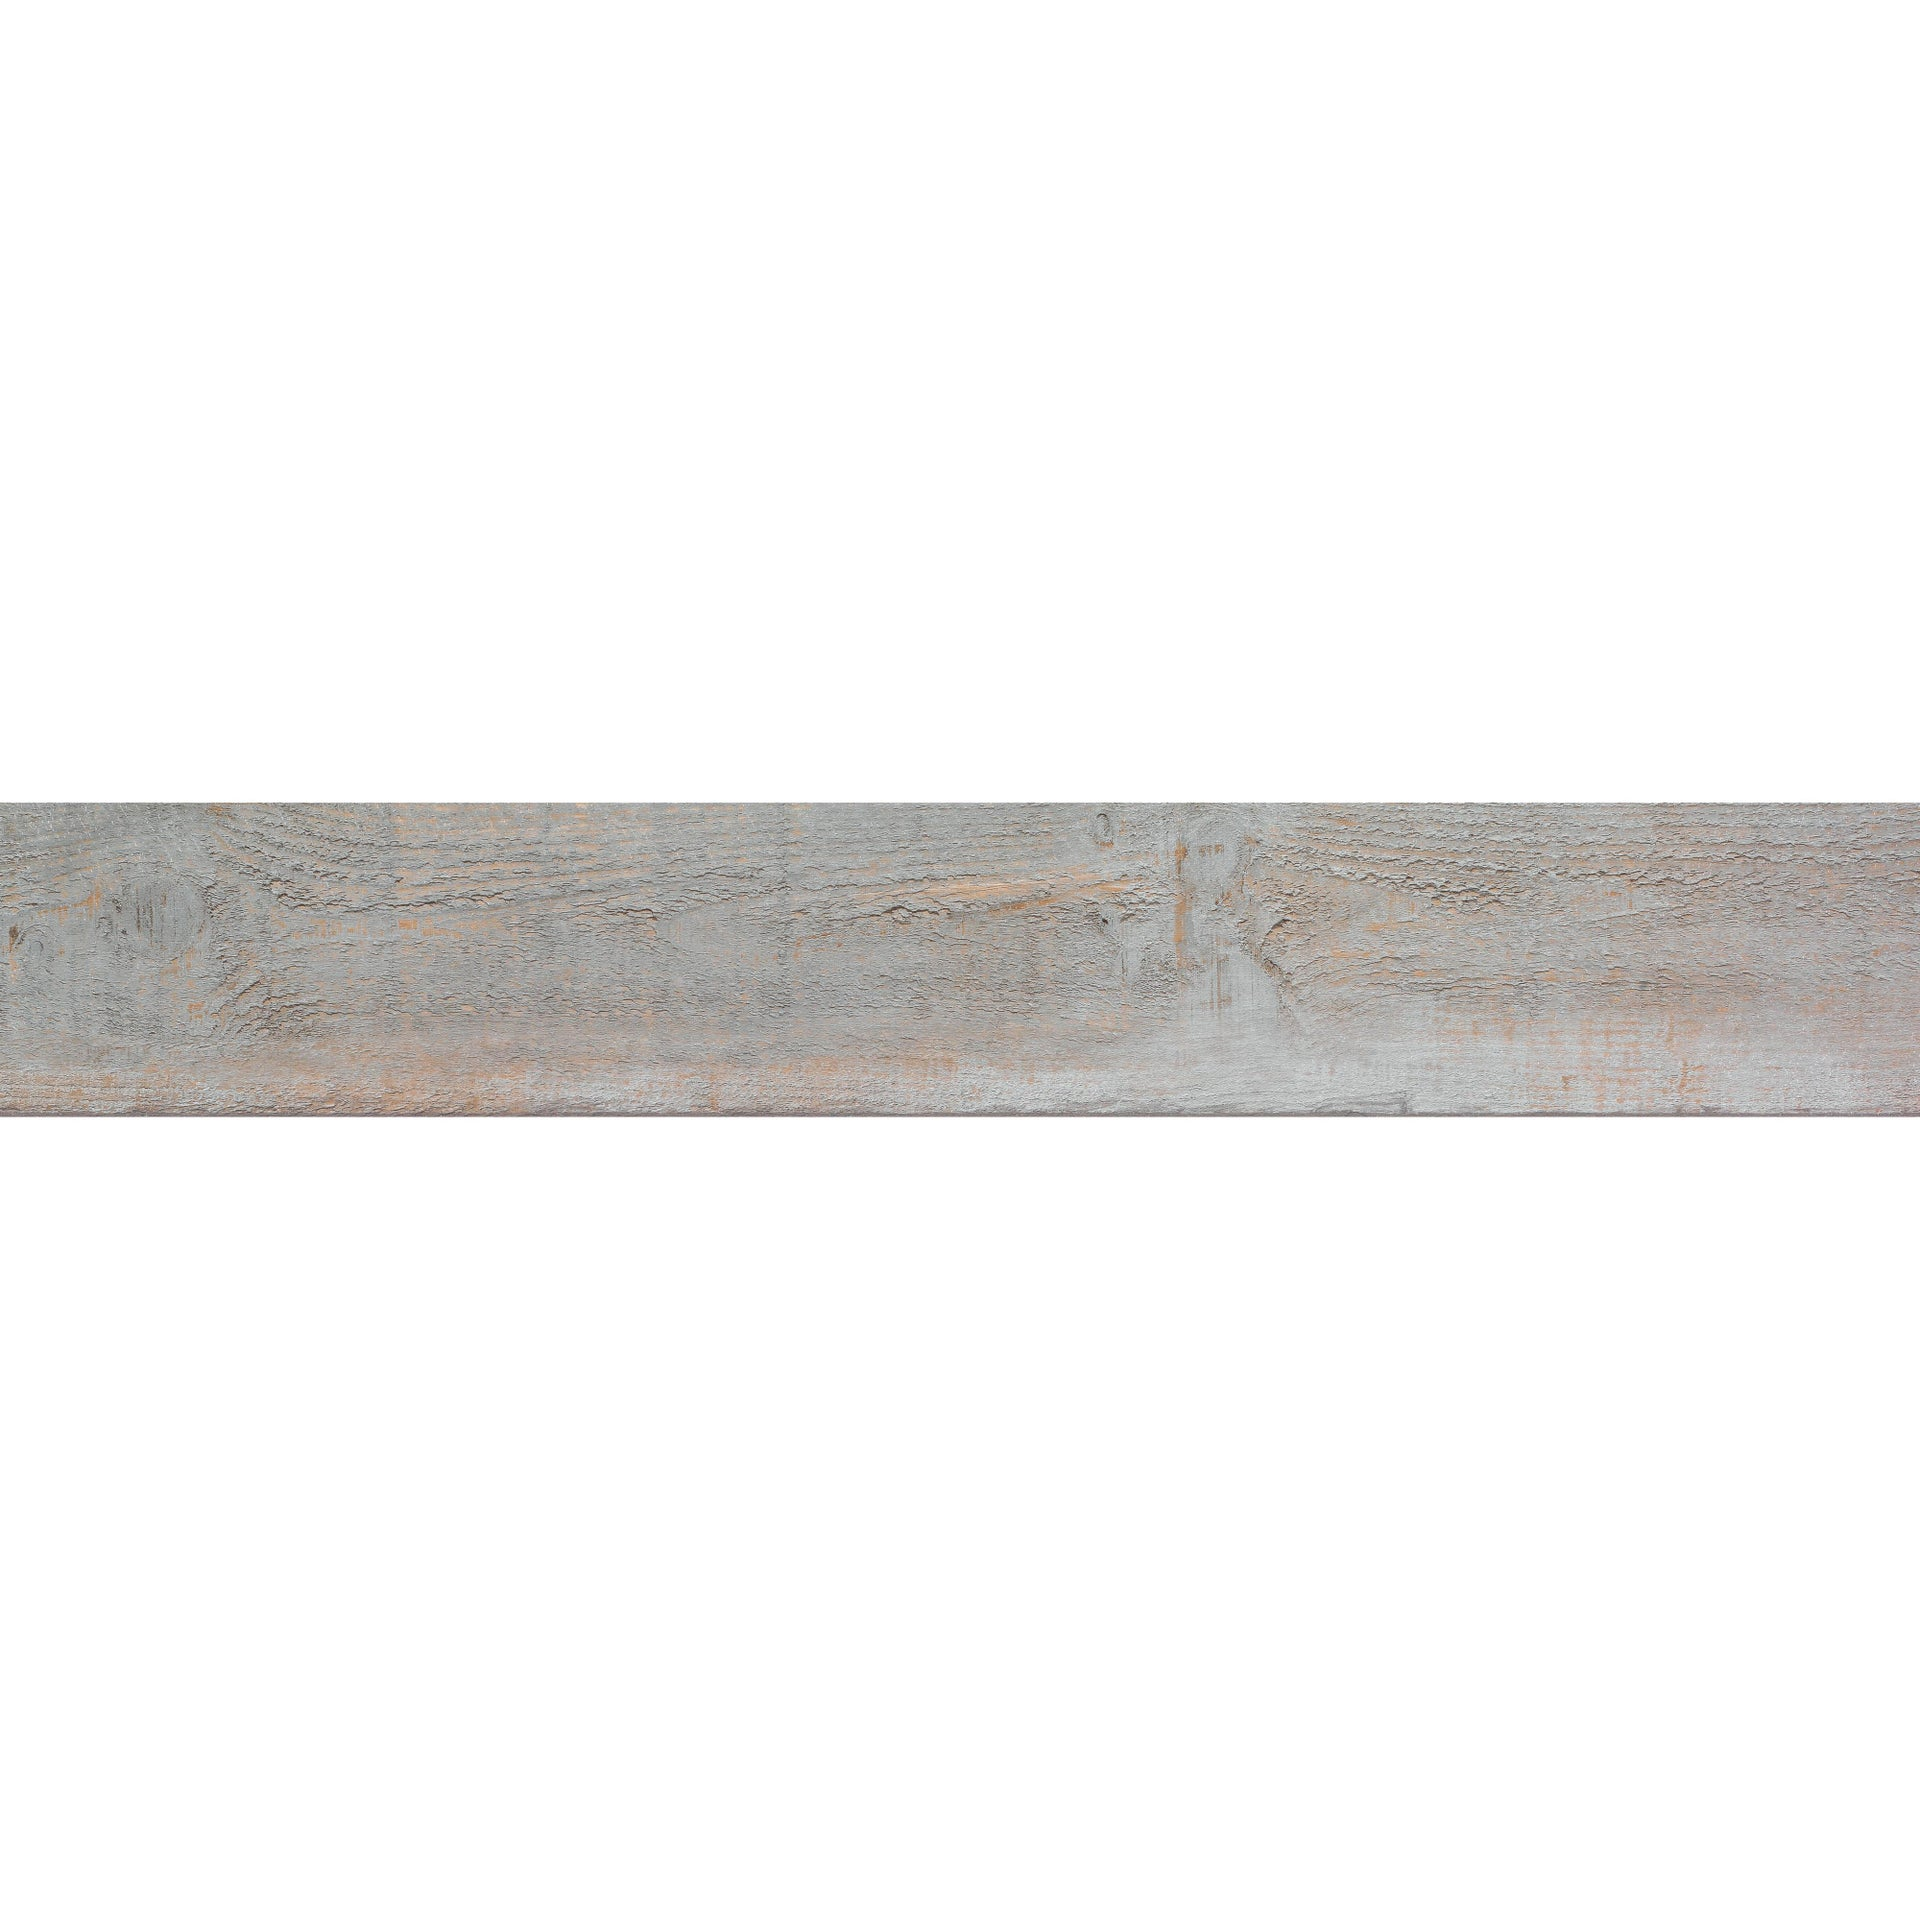 Pavimento PVC adesivo Rustic kola Sp 2 mm grigio / argento - 1